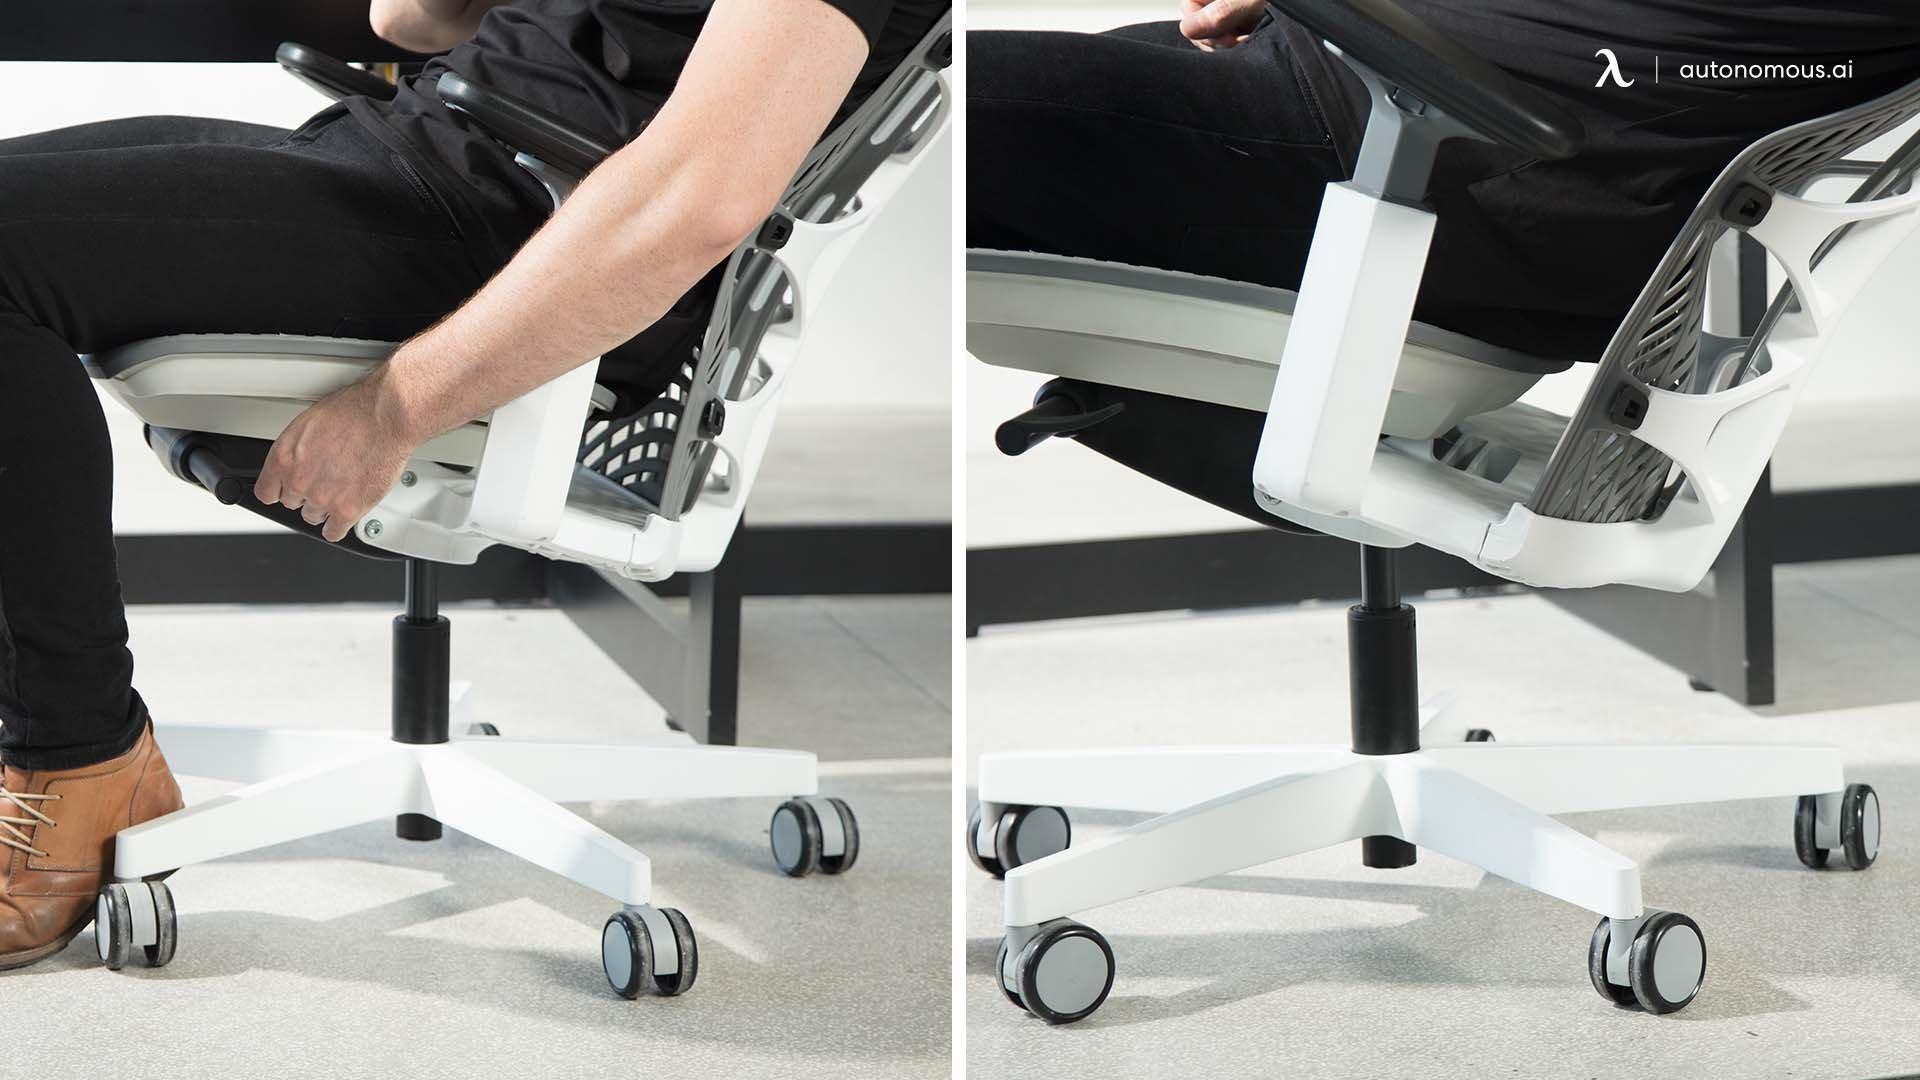 How to adjust the seat tilt and backrest?